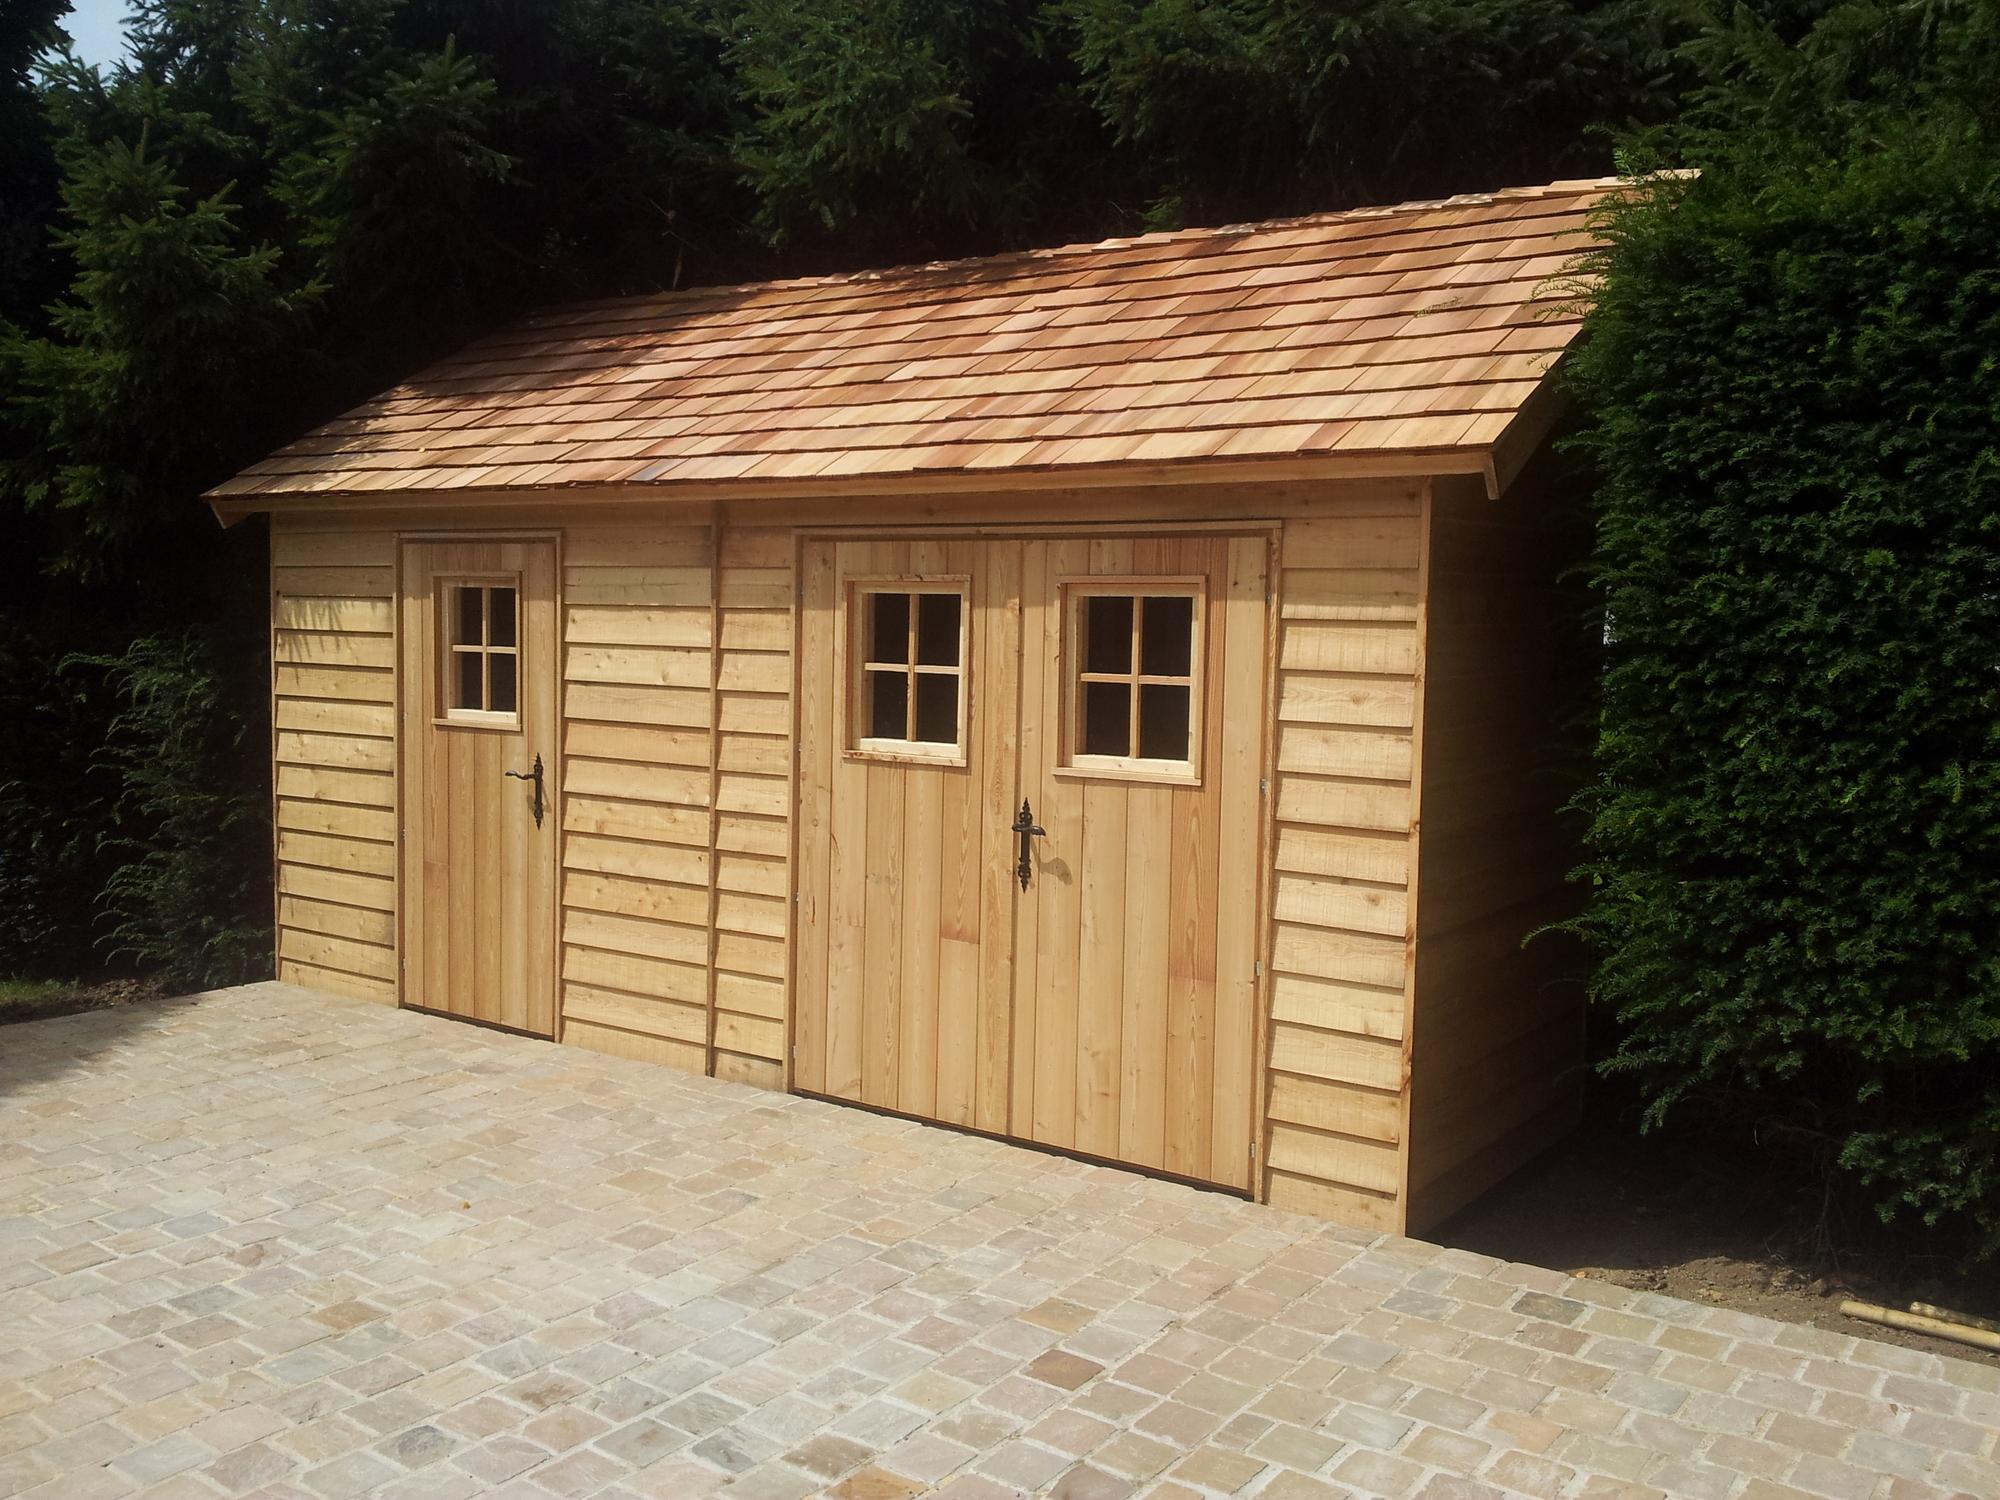 construction cabane bois brabant wallon harmonie et confort du bois harmonie et confort du bois. Black Bedroom Furniture Sets. Home Design Ideas